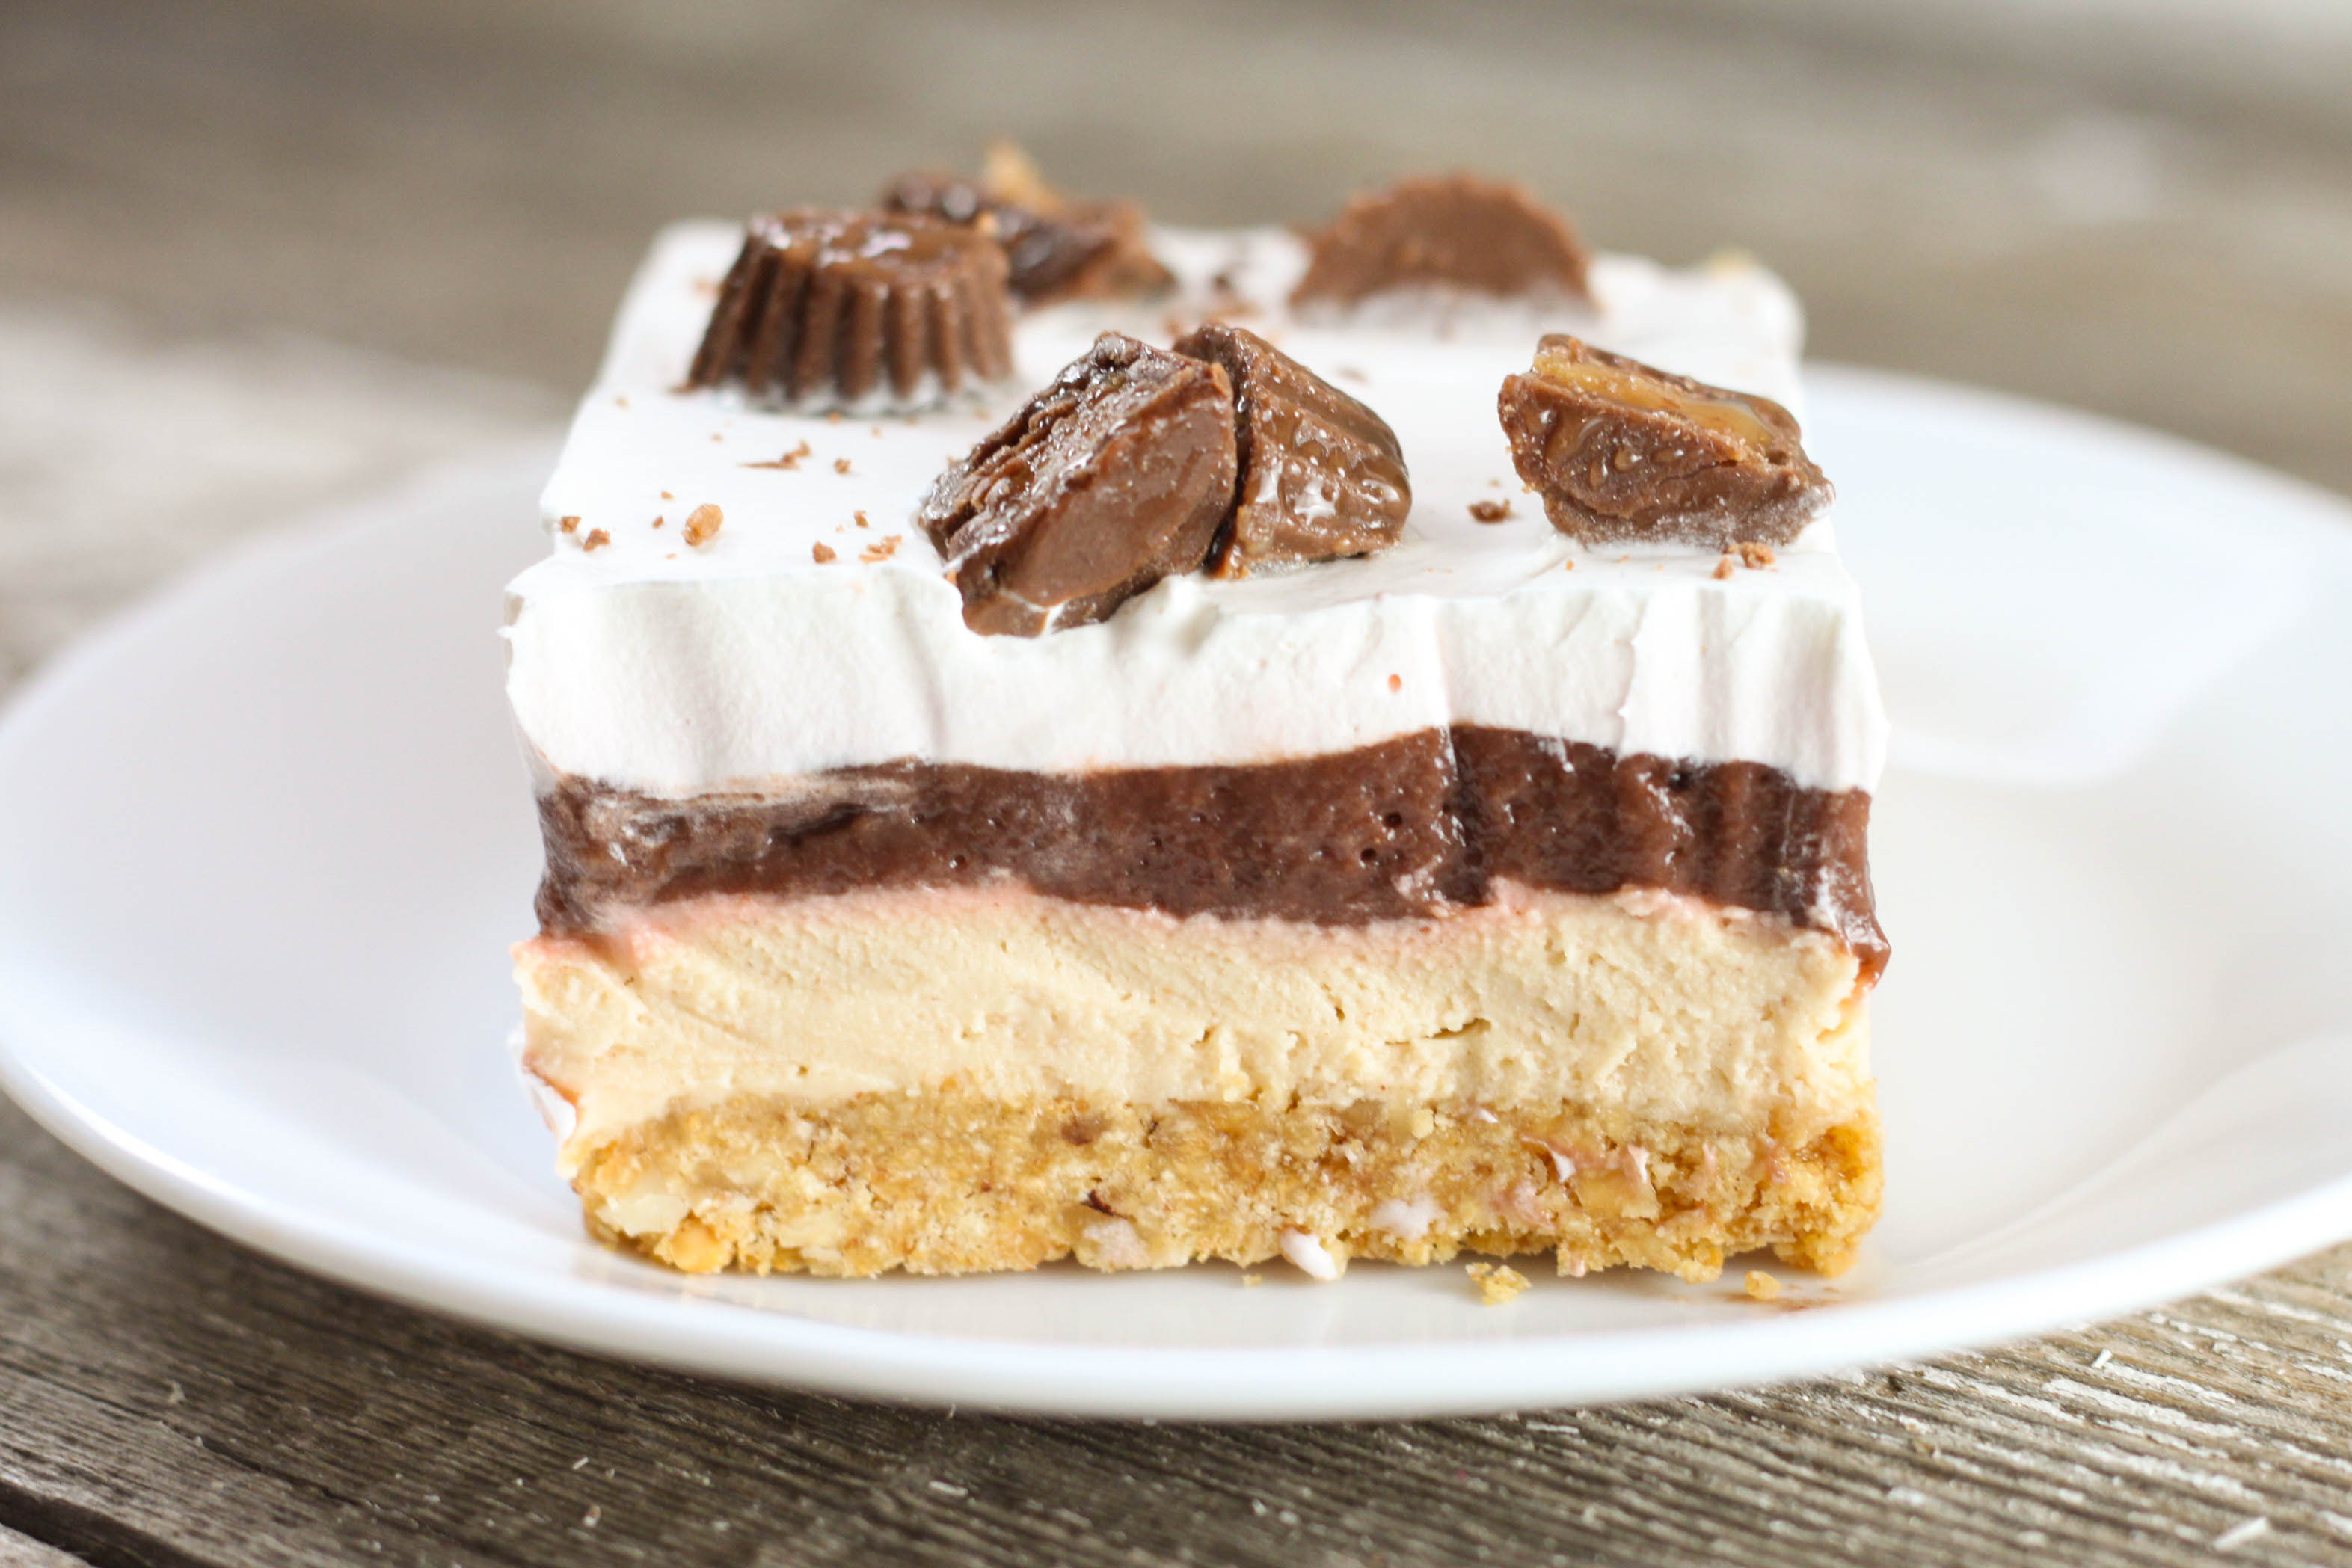 Chocolate Peanut Butter Dessert Recipe  No Bake Chocolate Peanut Butter Delight The Farmwife Cooks